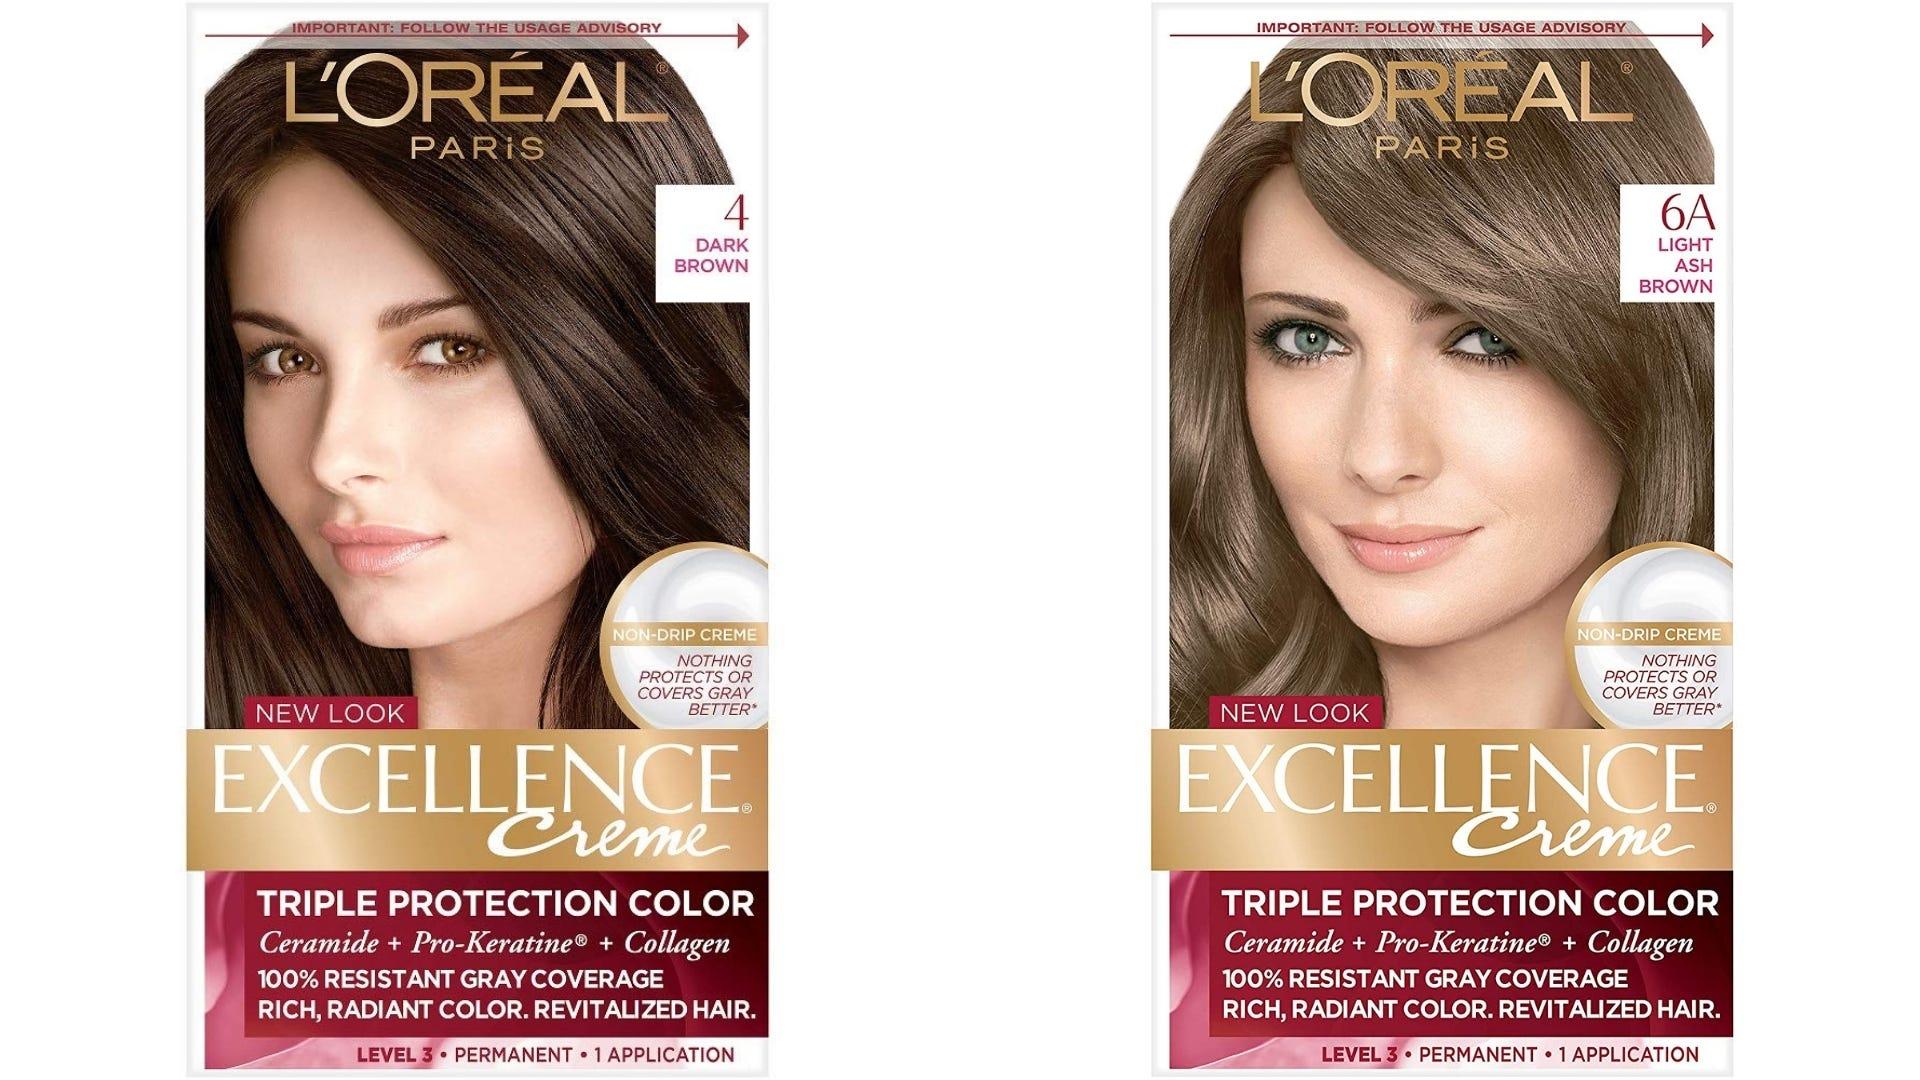 Two boxes of L'Oreal hair dye